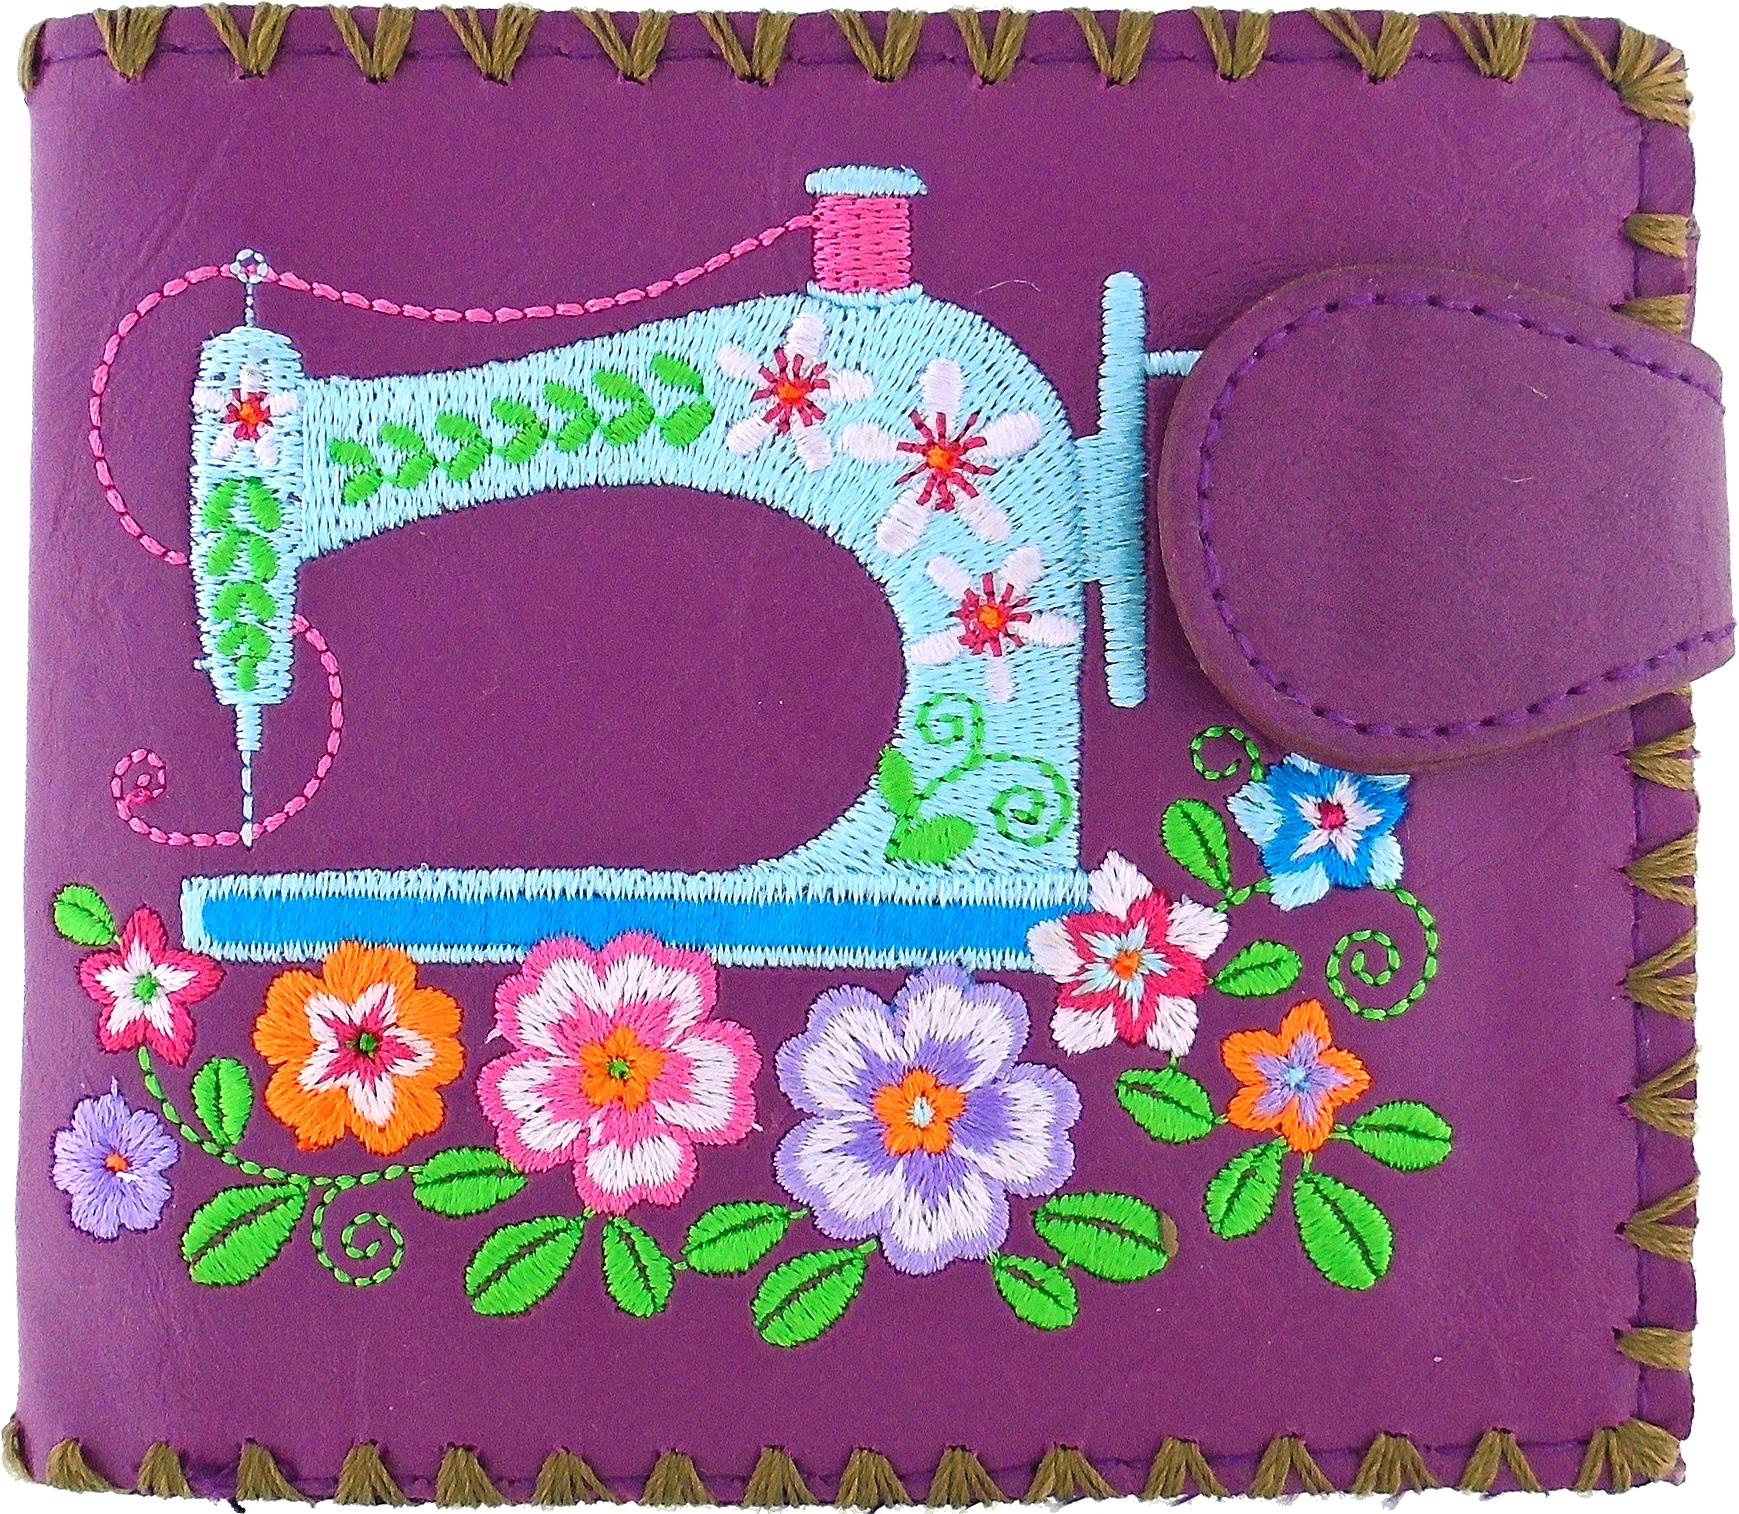 Sewing Machine Medium Embroidered Wallet - Purple